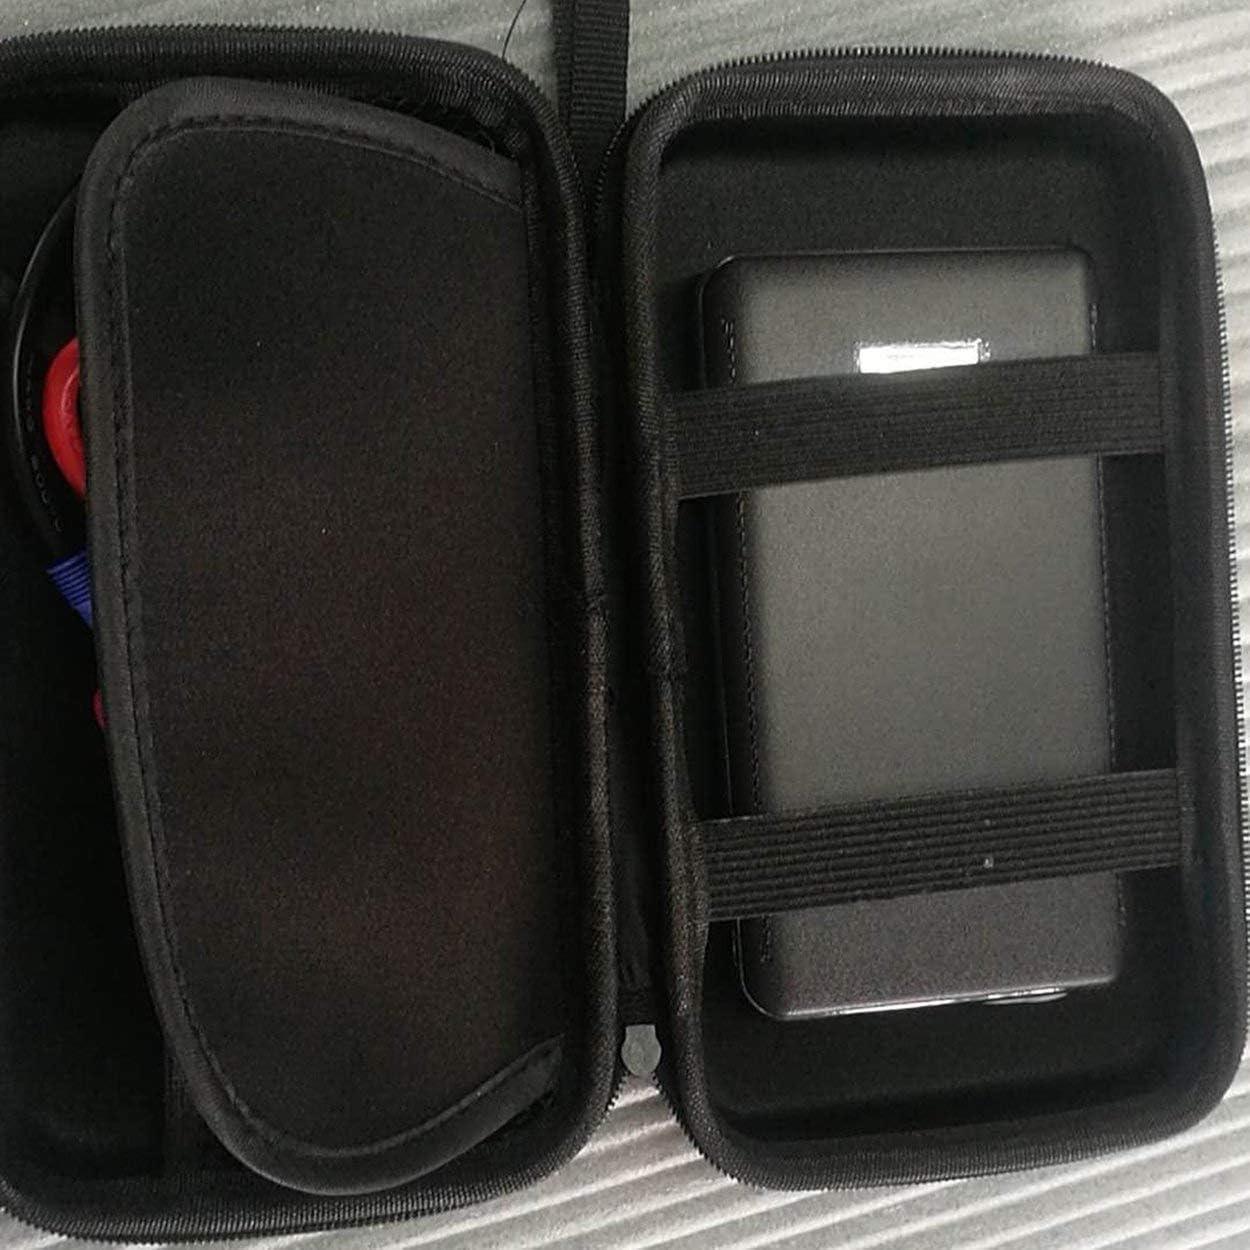 Lorenlli 30000mAh Caricabatteria Portatile per Auto Salto Starter Pack Caricabatterie LED Batteria Alimentazione Banca Avviamento di Emergenza